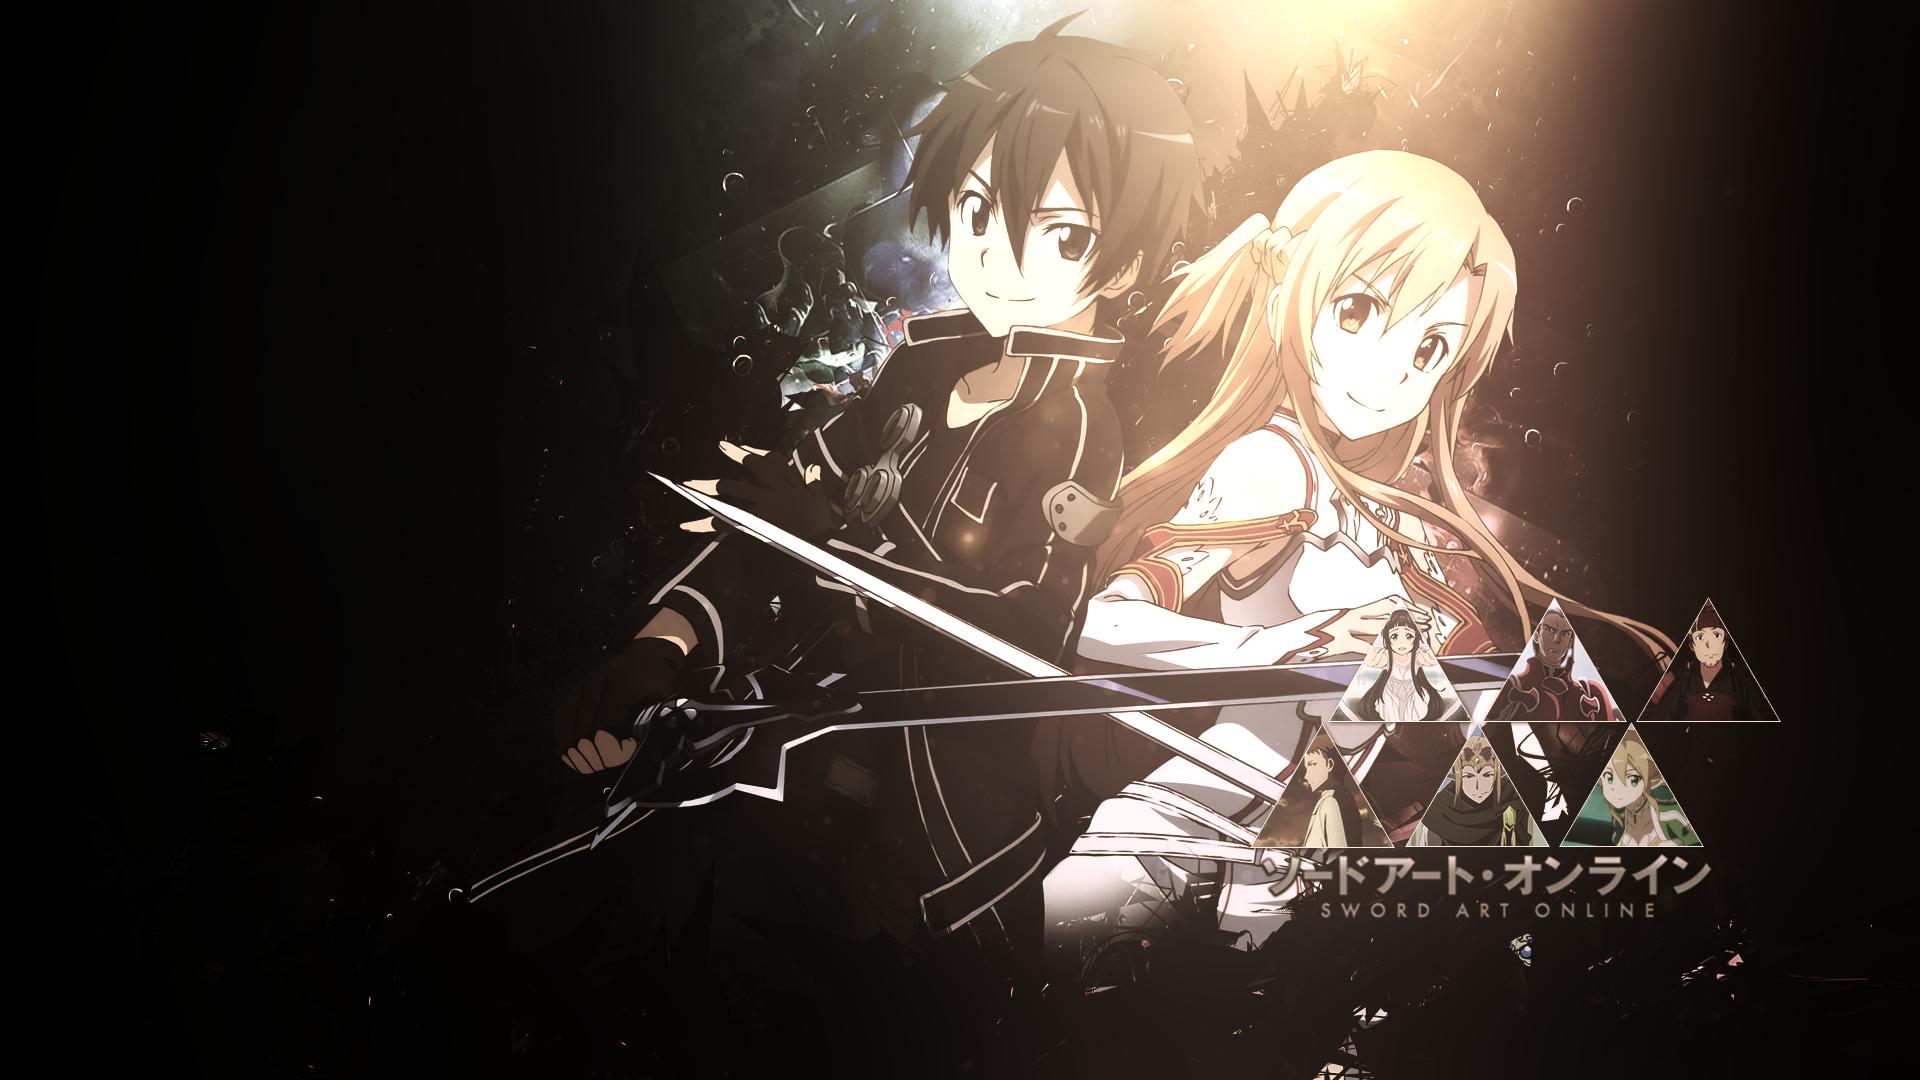 Sword art online wallpaper 1 by dani17k customization wallpaper other